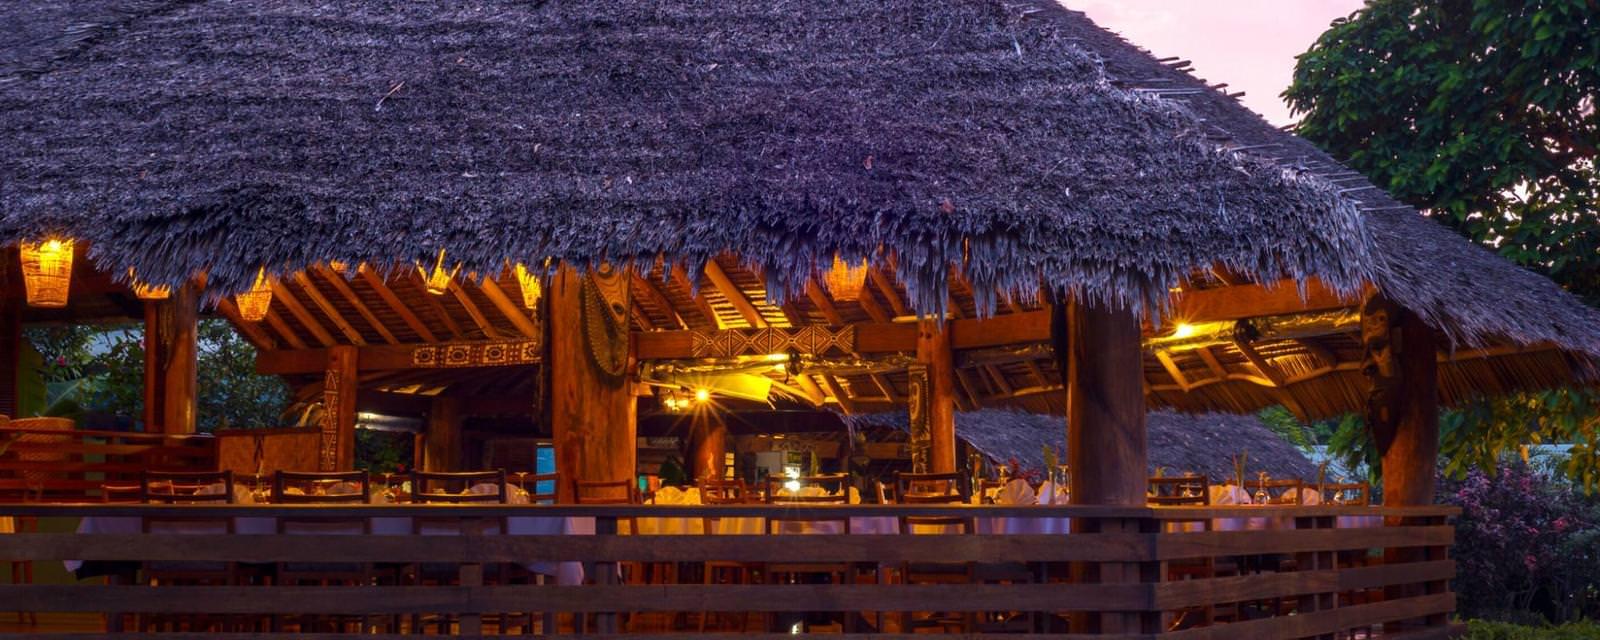 Ultimate List of Best Luxury Hotels in New Britain Islands Papua New Guinea Kokopo Beach Bungalow Resort